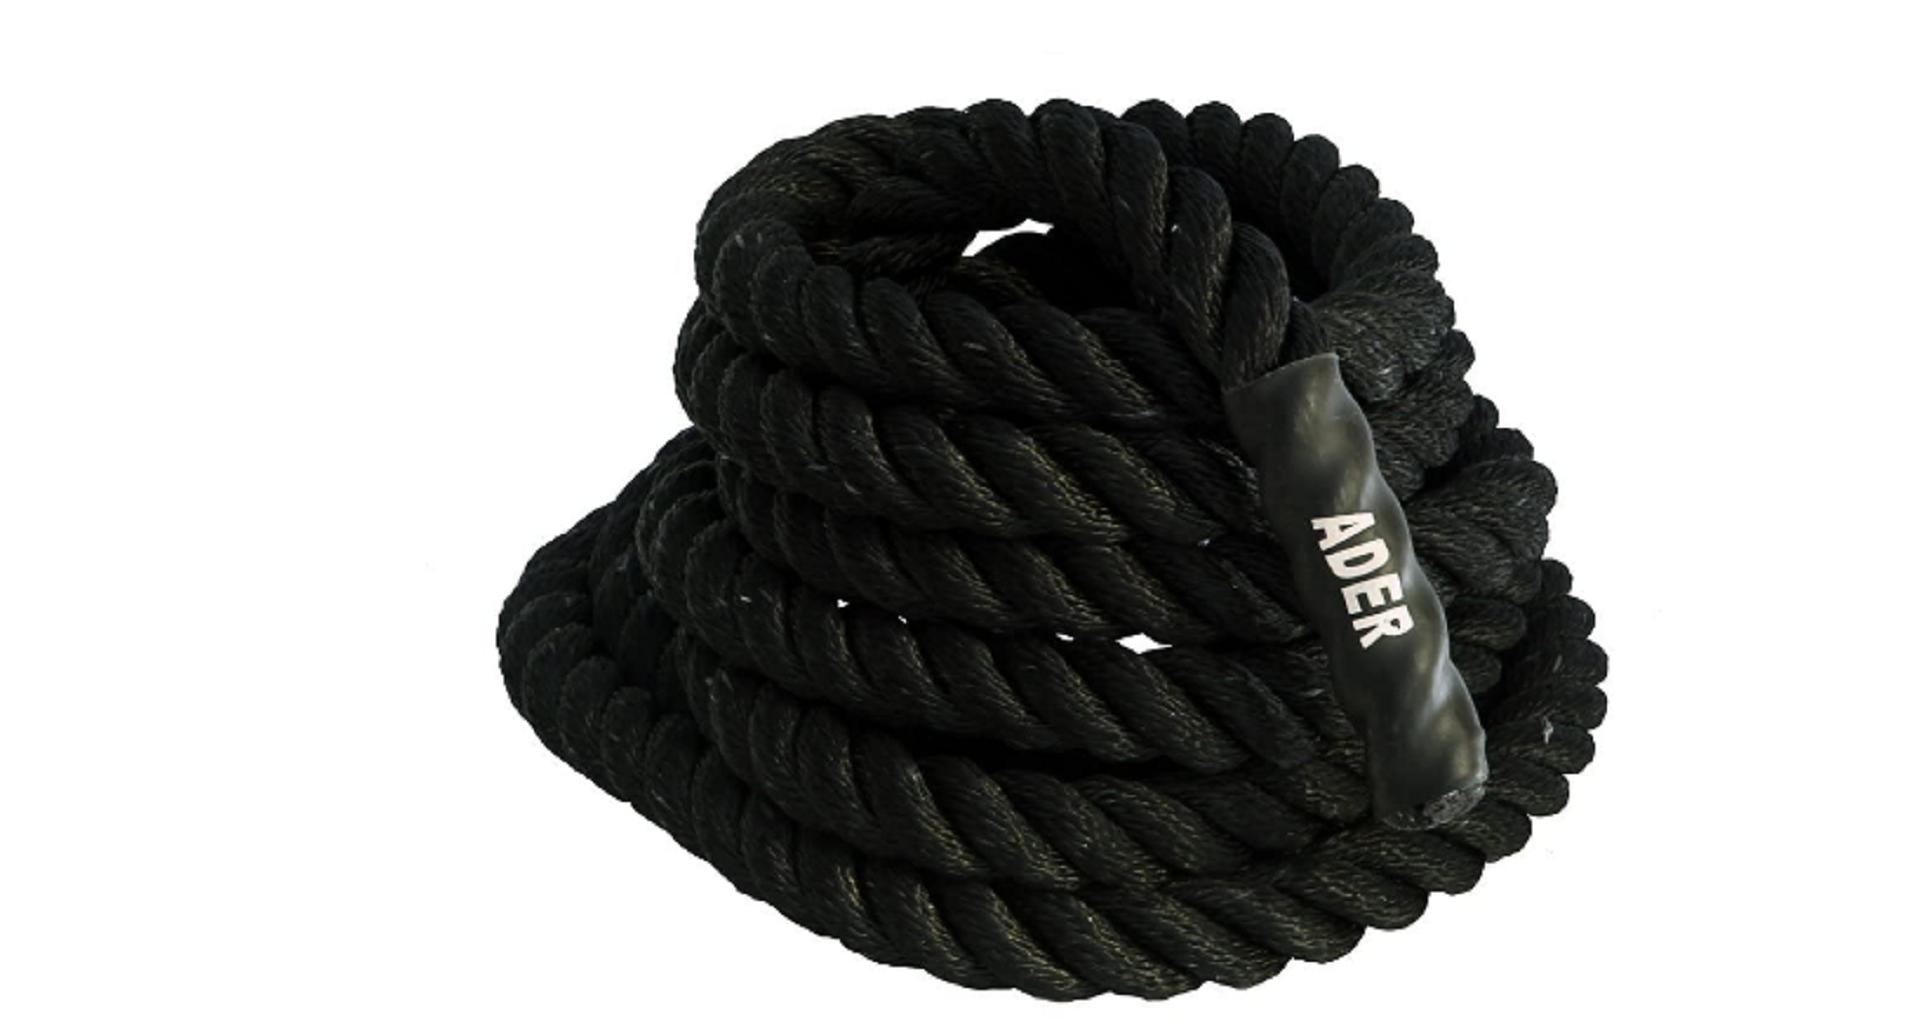 anchor ader battle rope